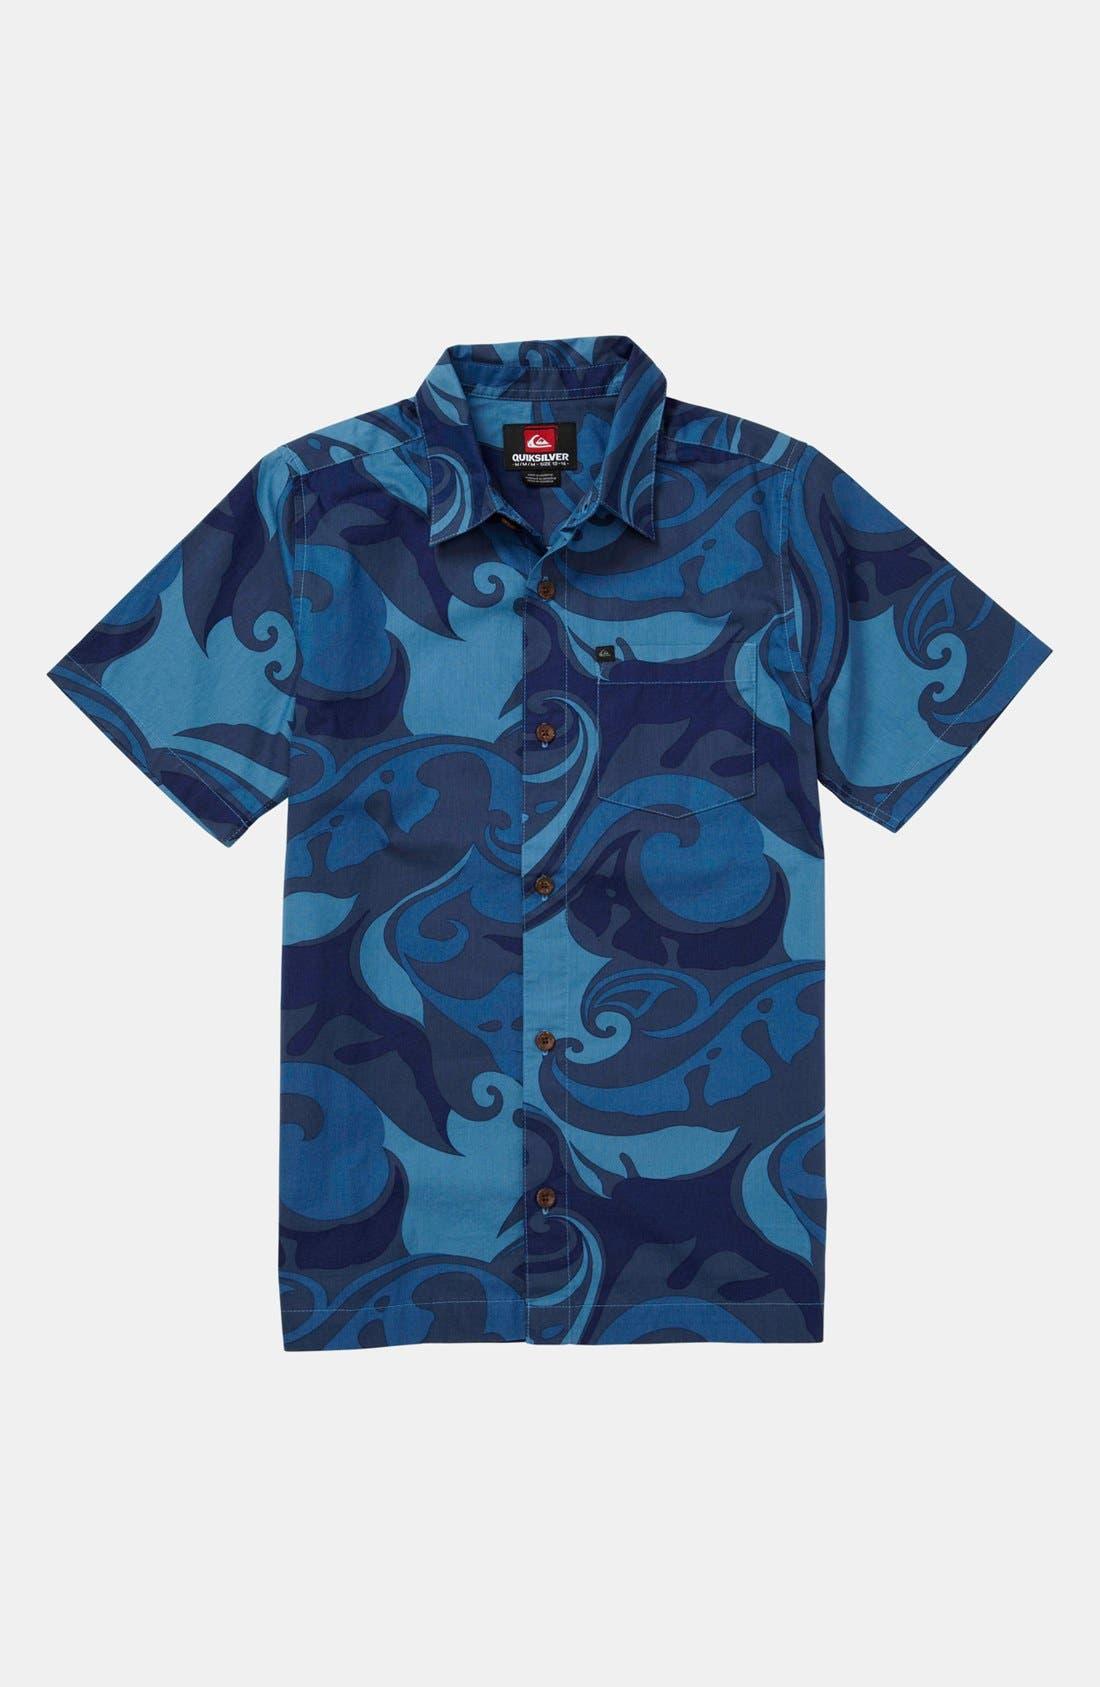 Alternate Image 1 Selected - Quiksilver 'Moku' Shirt (Little Boys & Big Boys)